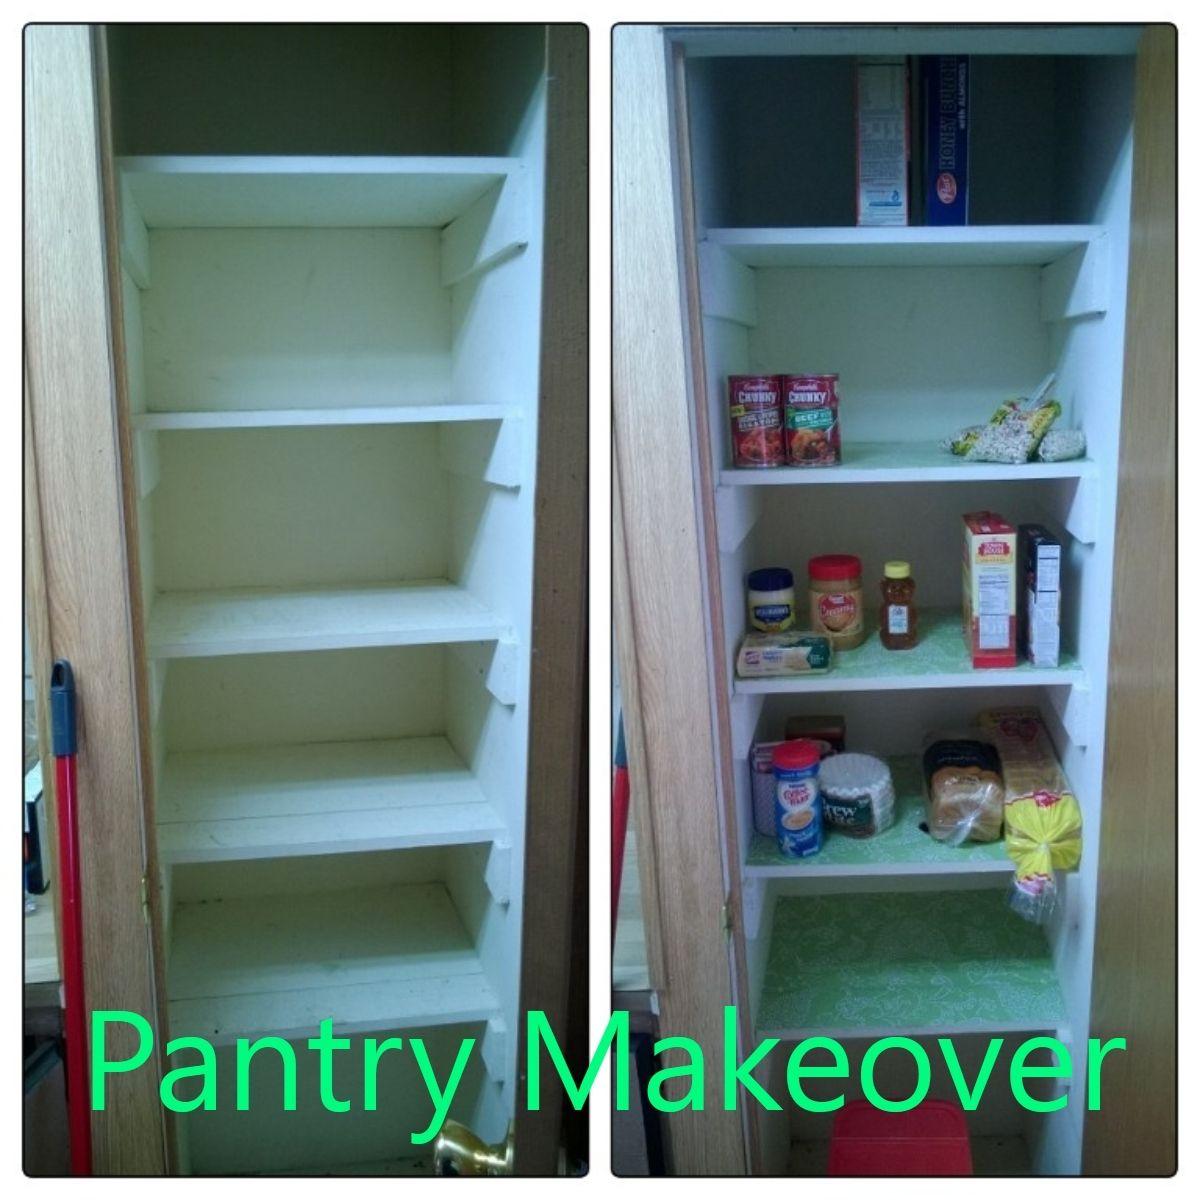 Kitchen pantry shelf liner